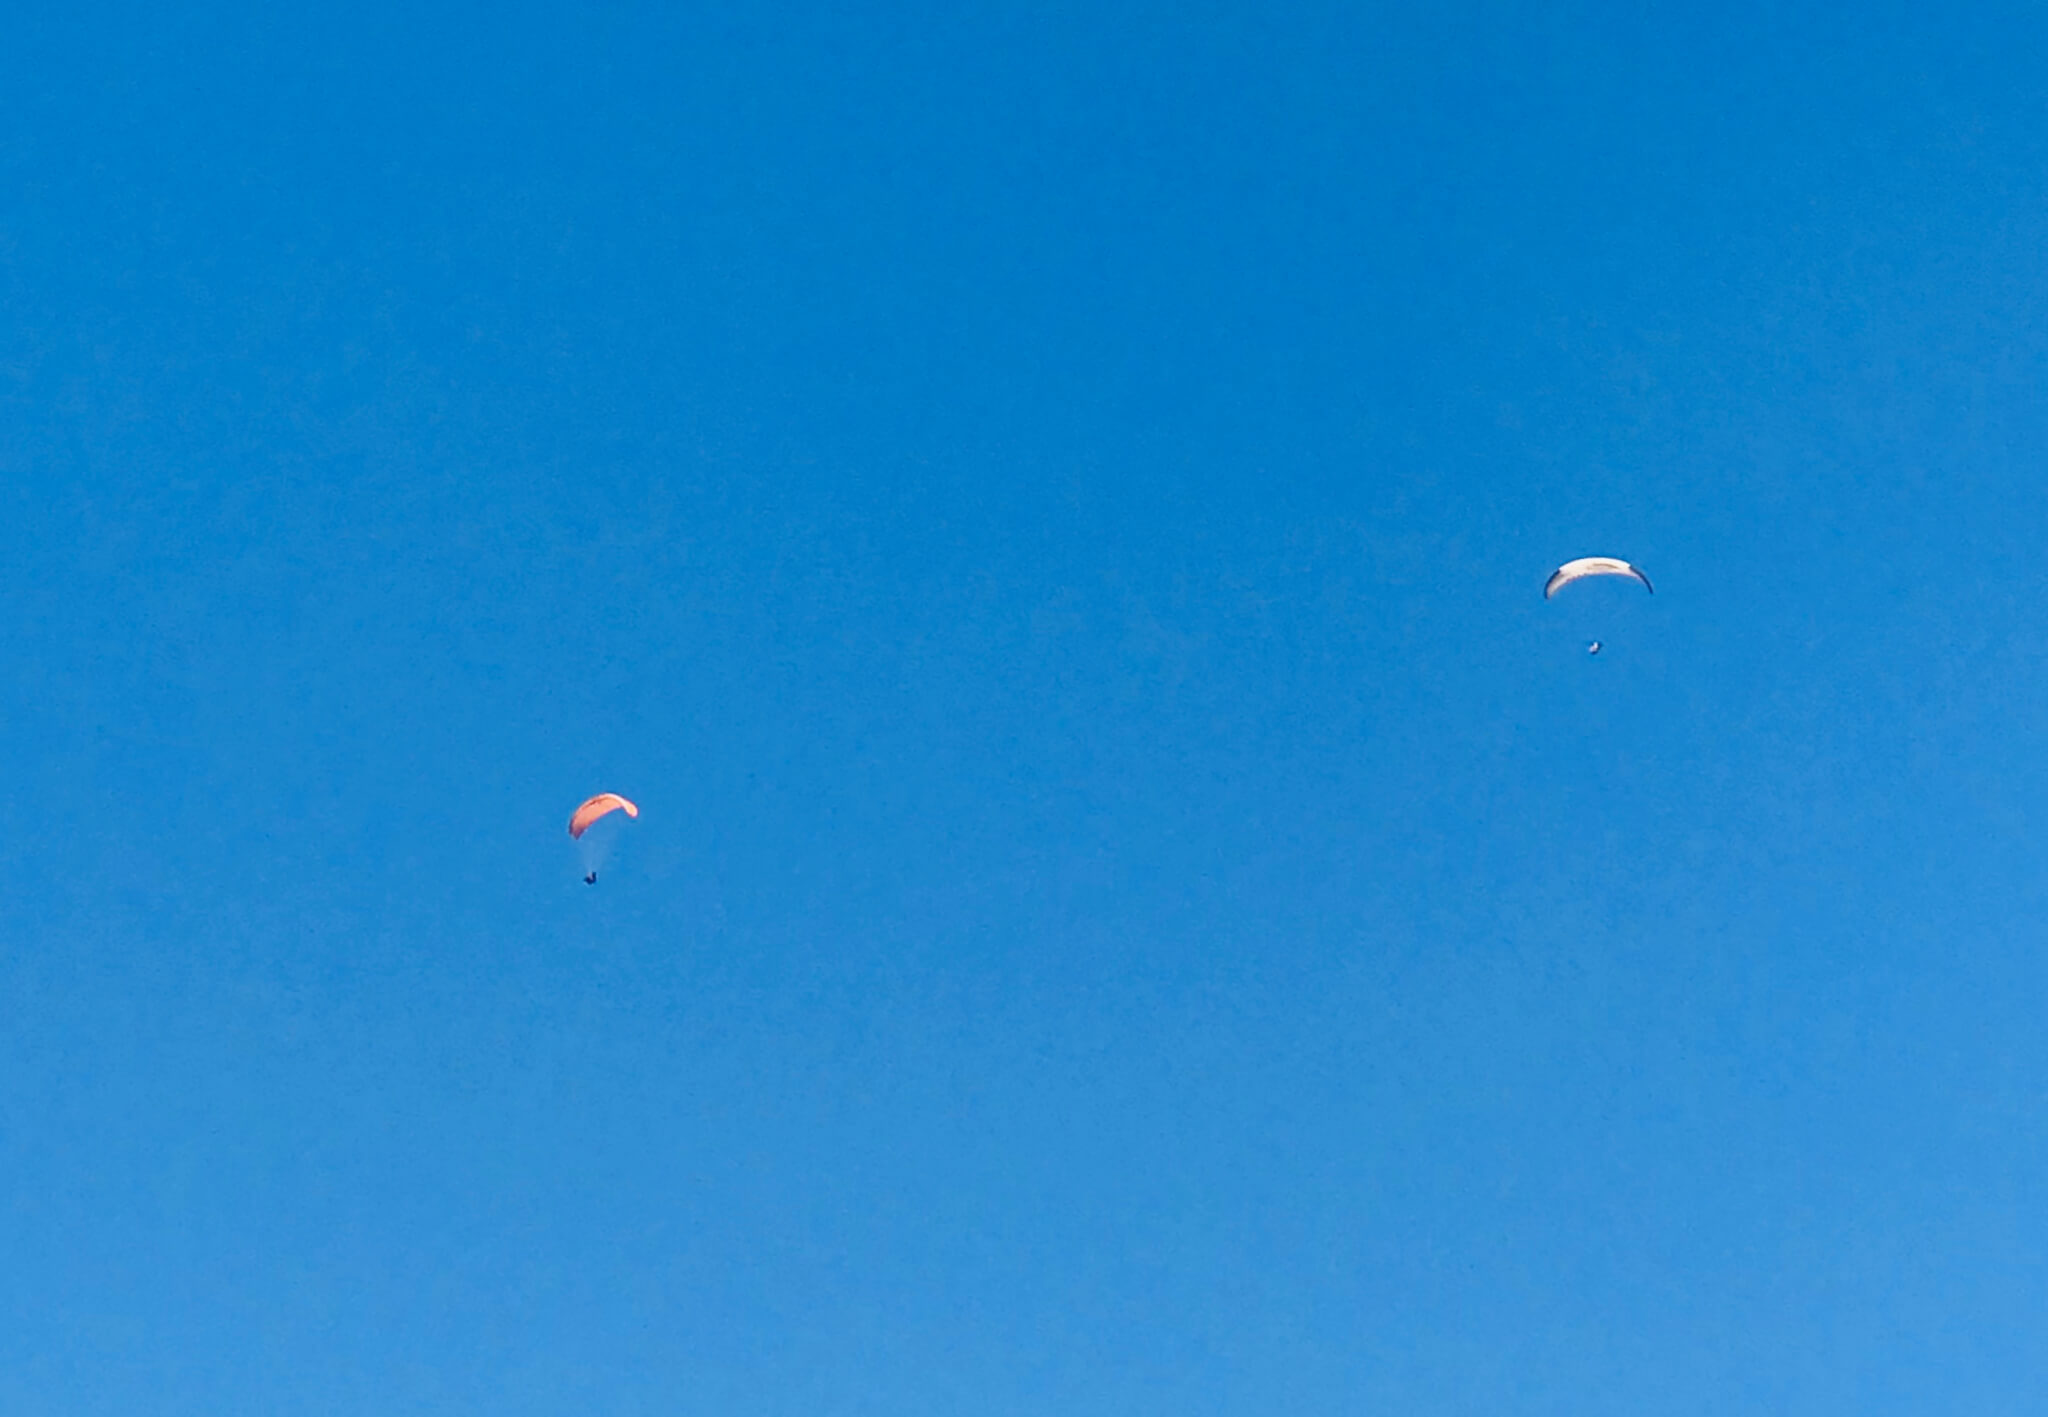 Paragliding and Hang-gliding in Valle de Bravo Mexico